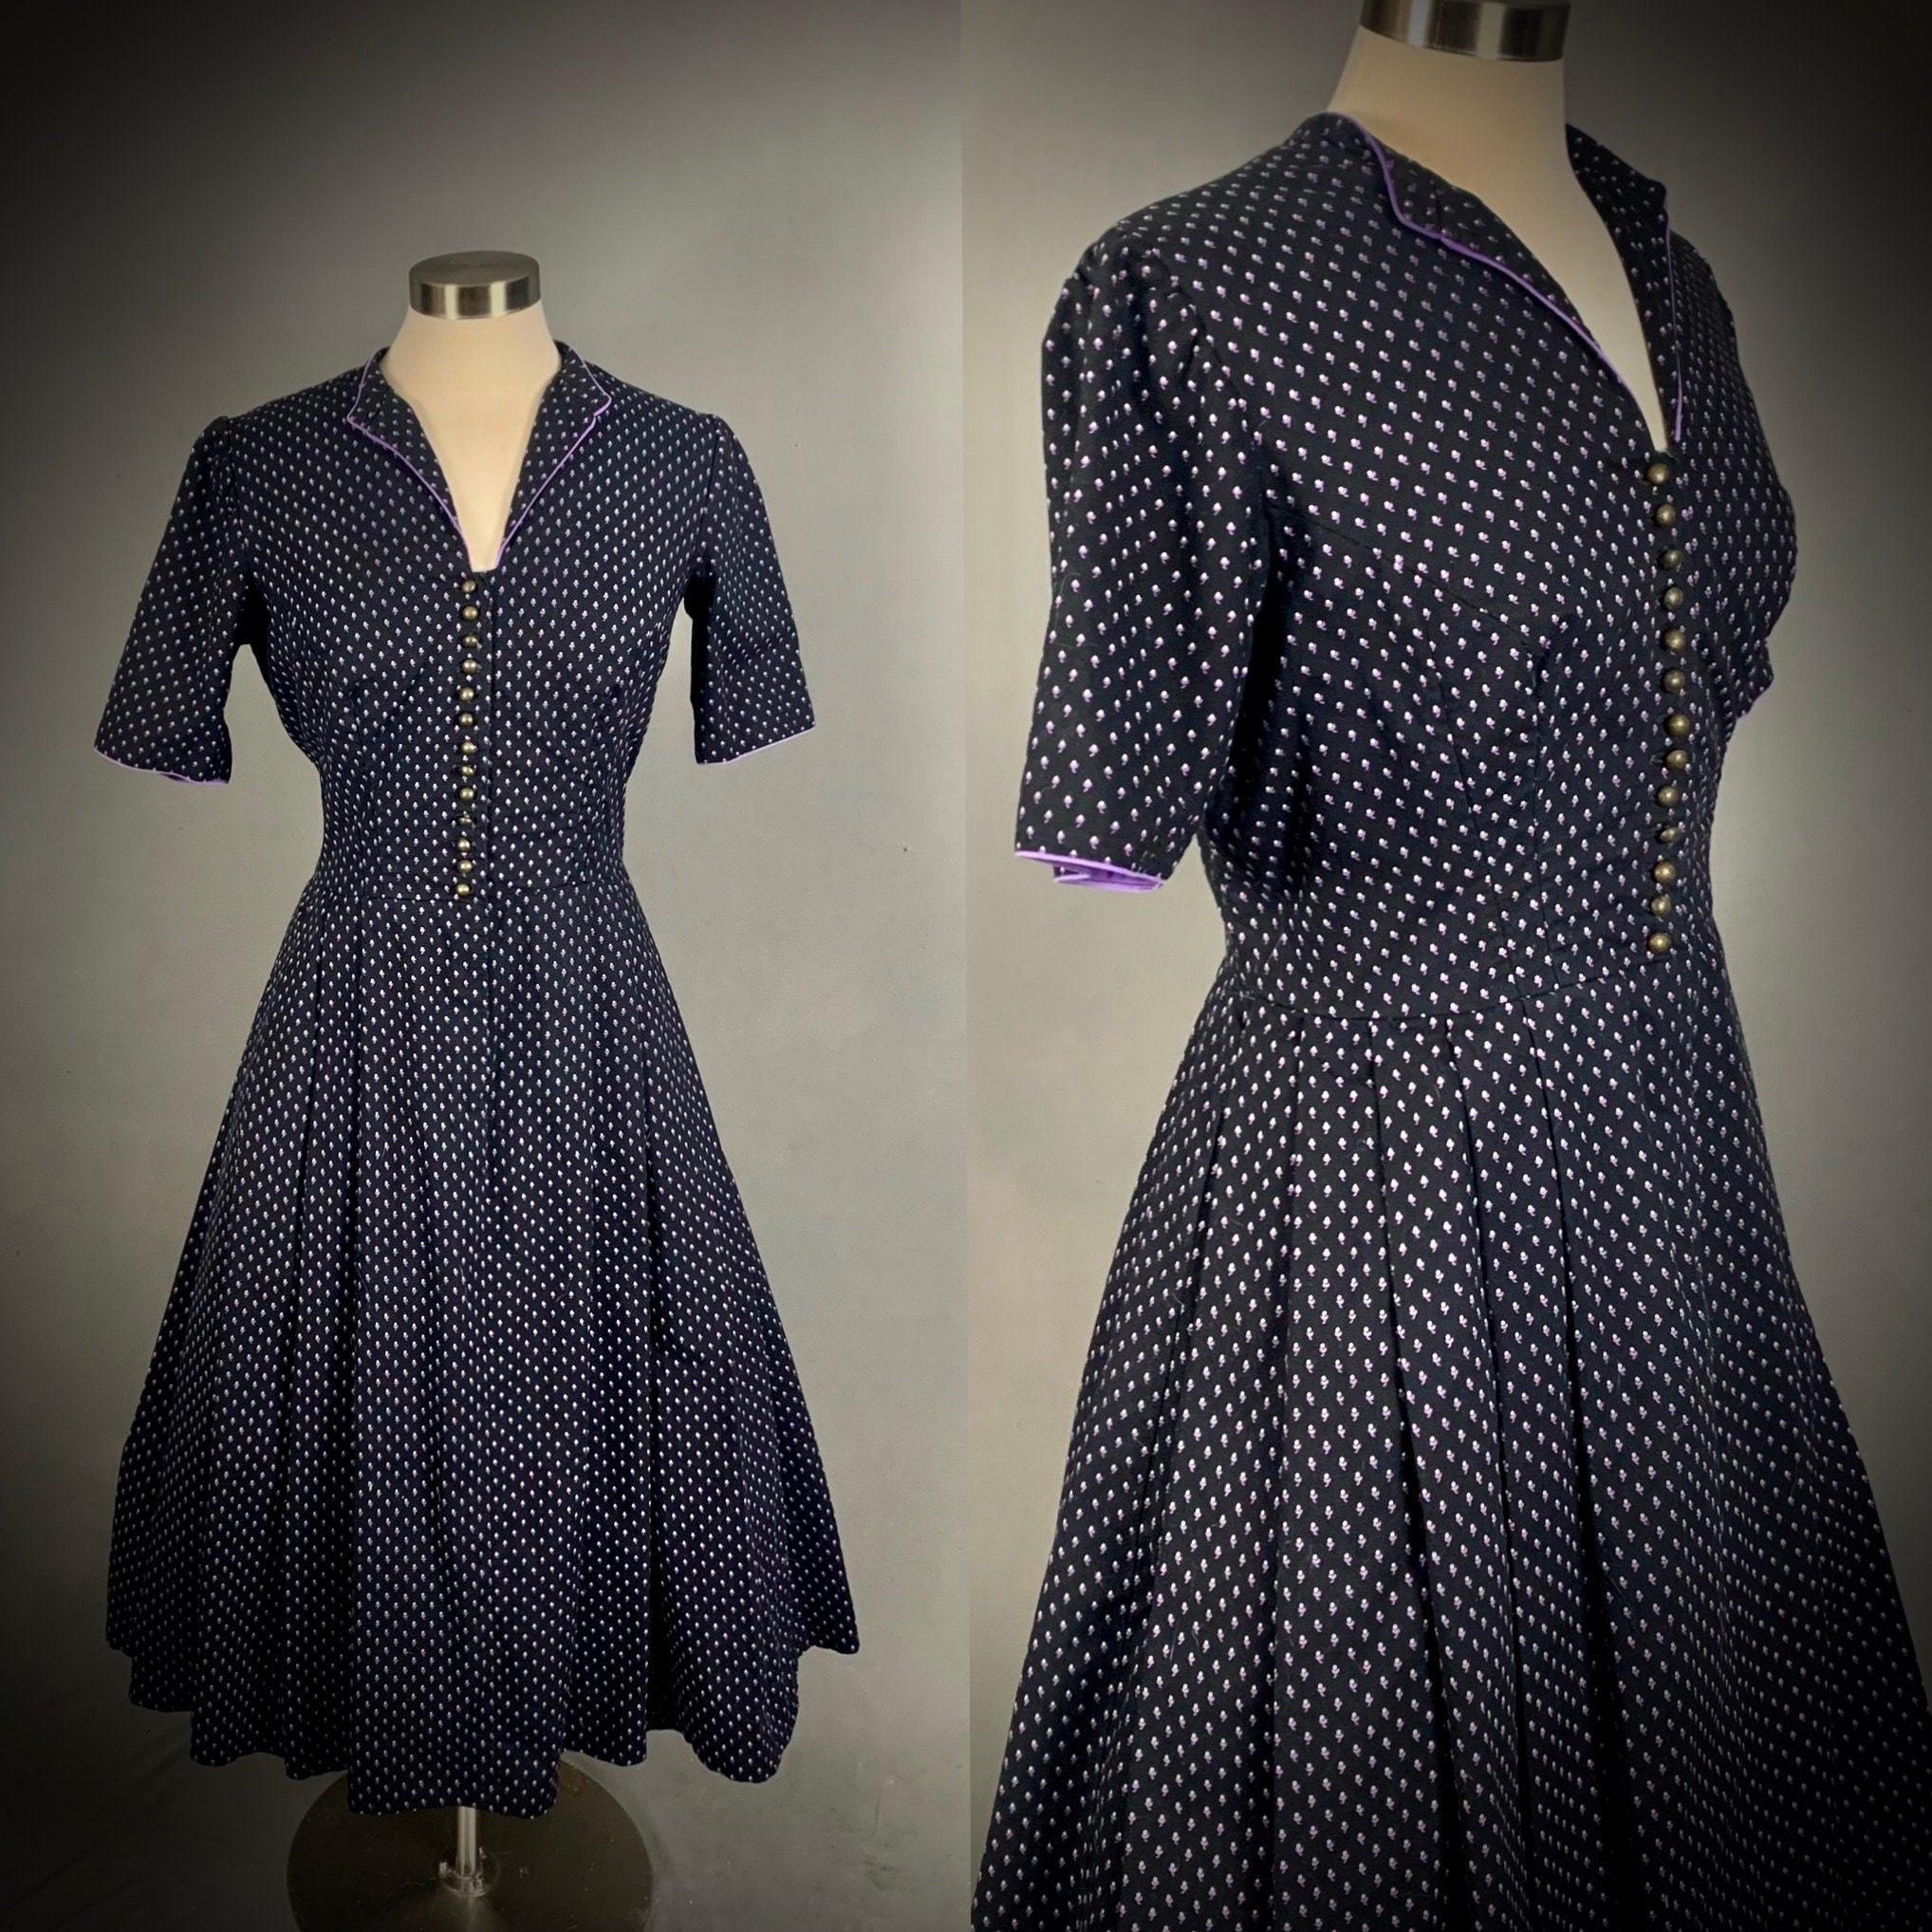 80s Dresses | Casual to Party Dresses Womens Vintage 80s Does 50s Cotton Shirtwaist Dress $0.00 AT vintagedancer.com